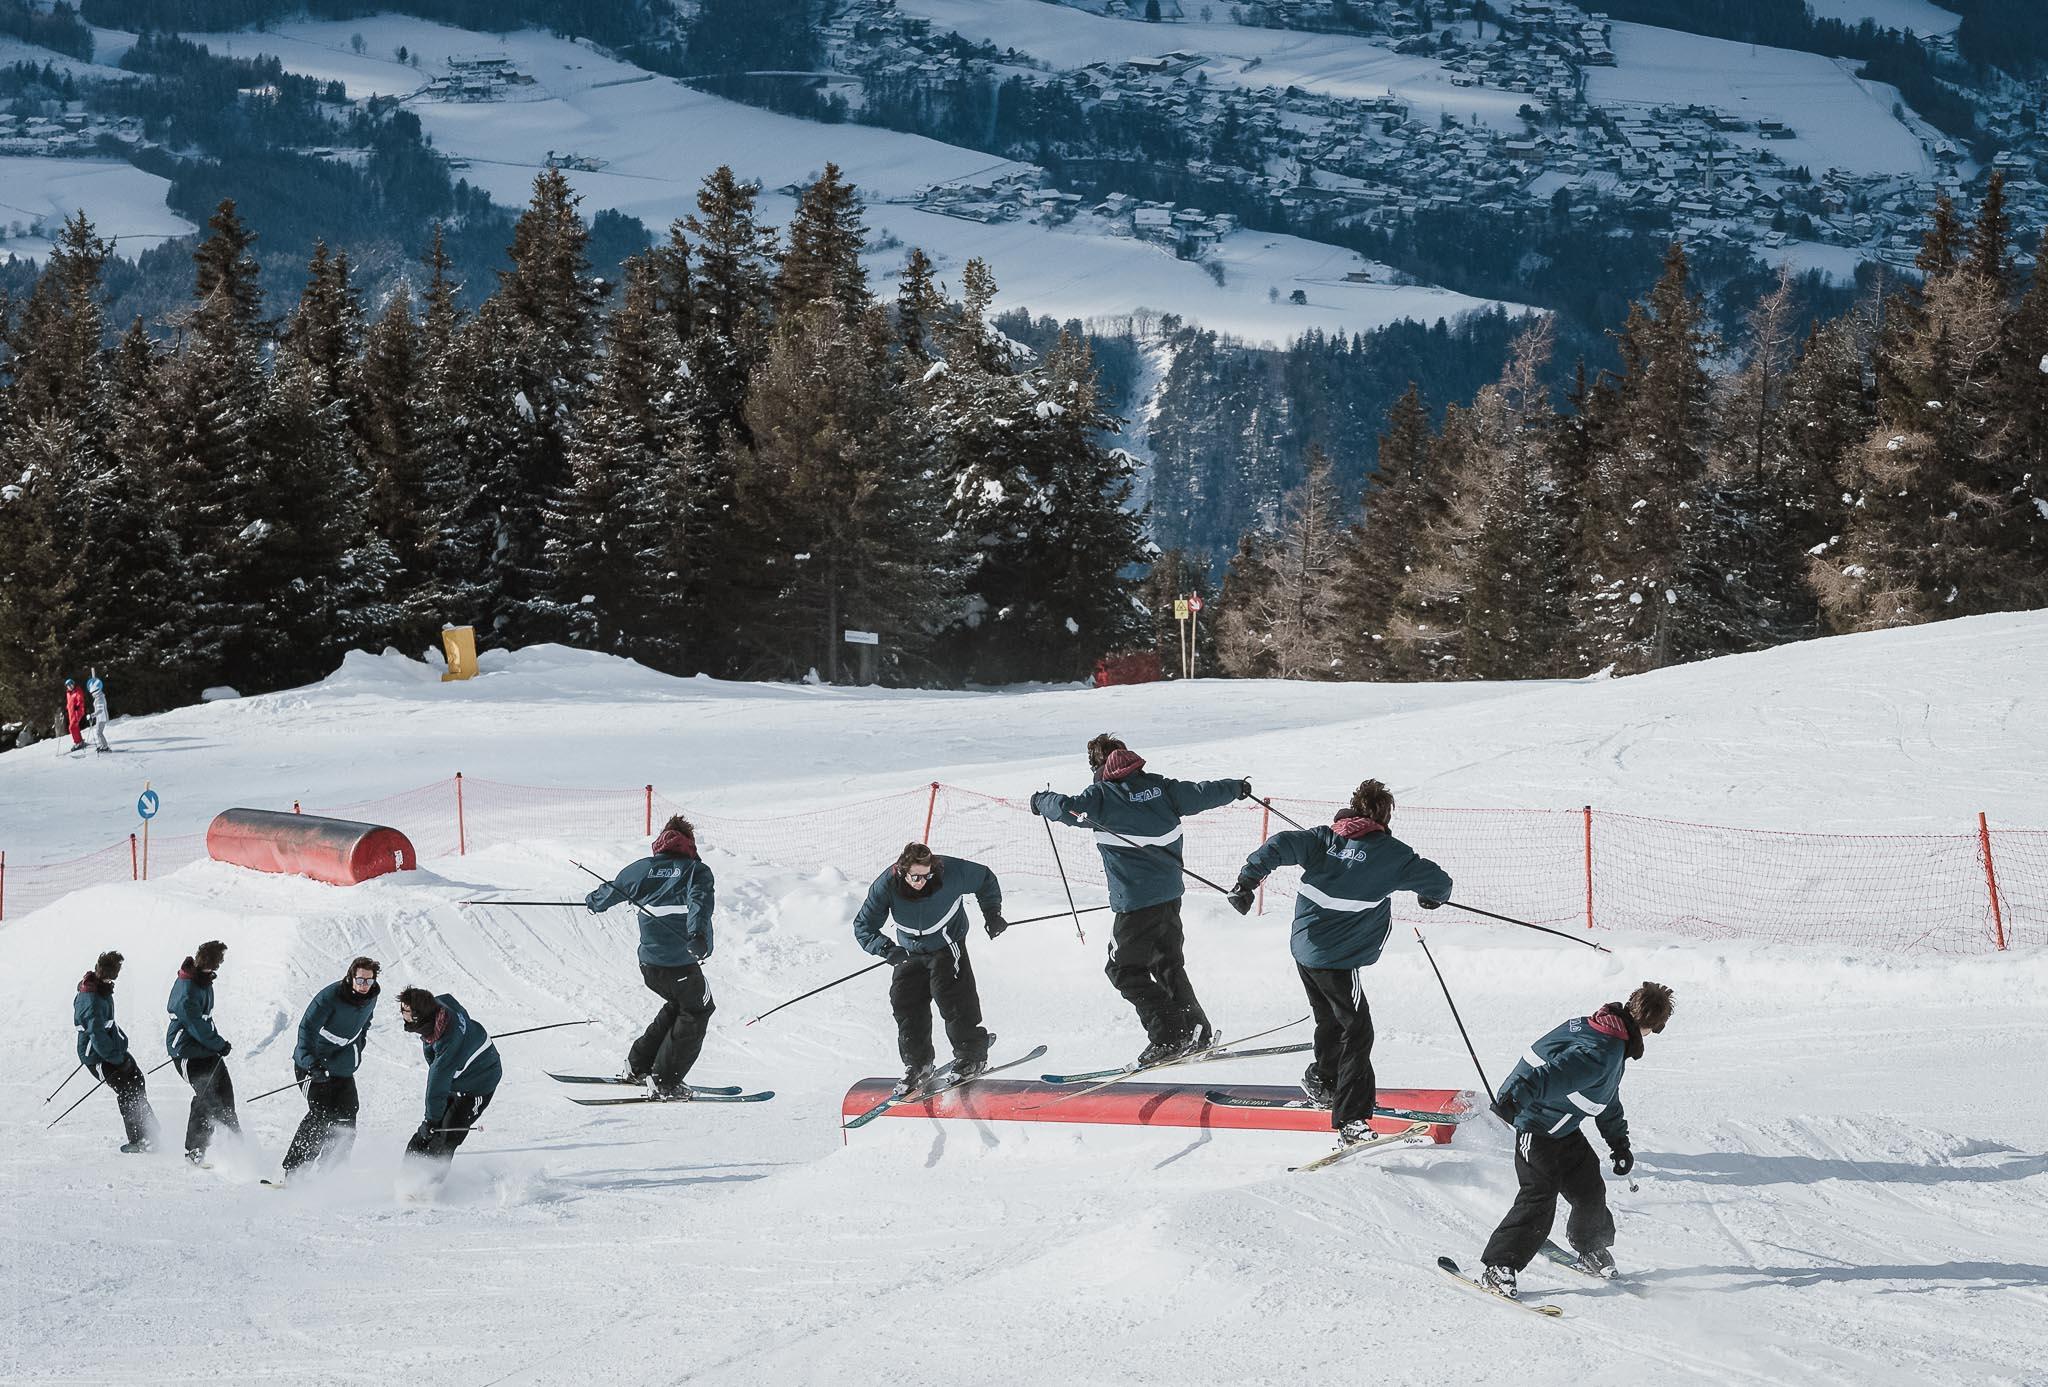 Location: Snowpark Patscherkofel - Trick: Switch Lip 2 continuing 4 - Foto: Jörg Angeli